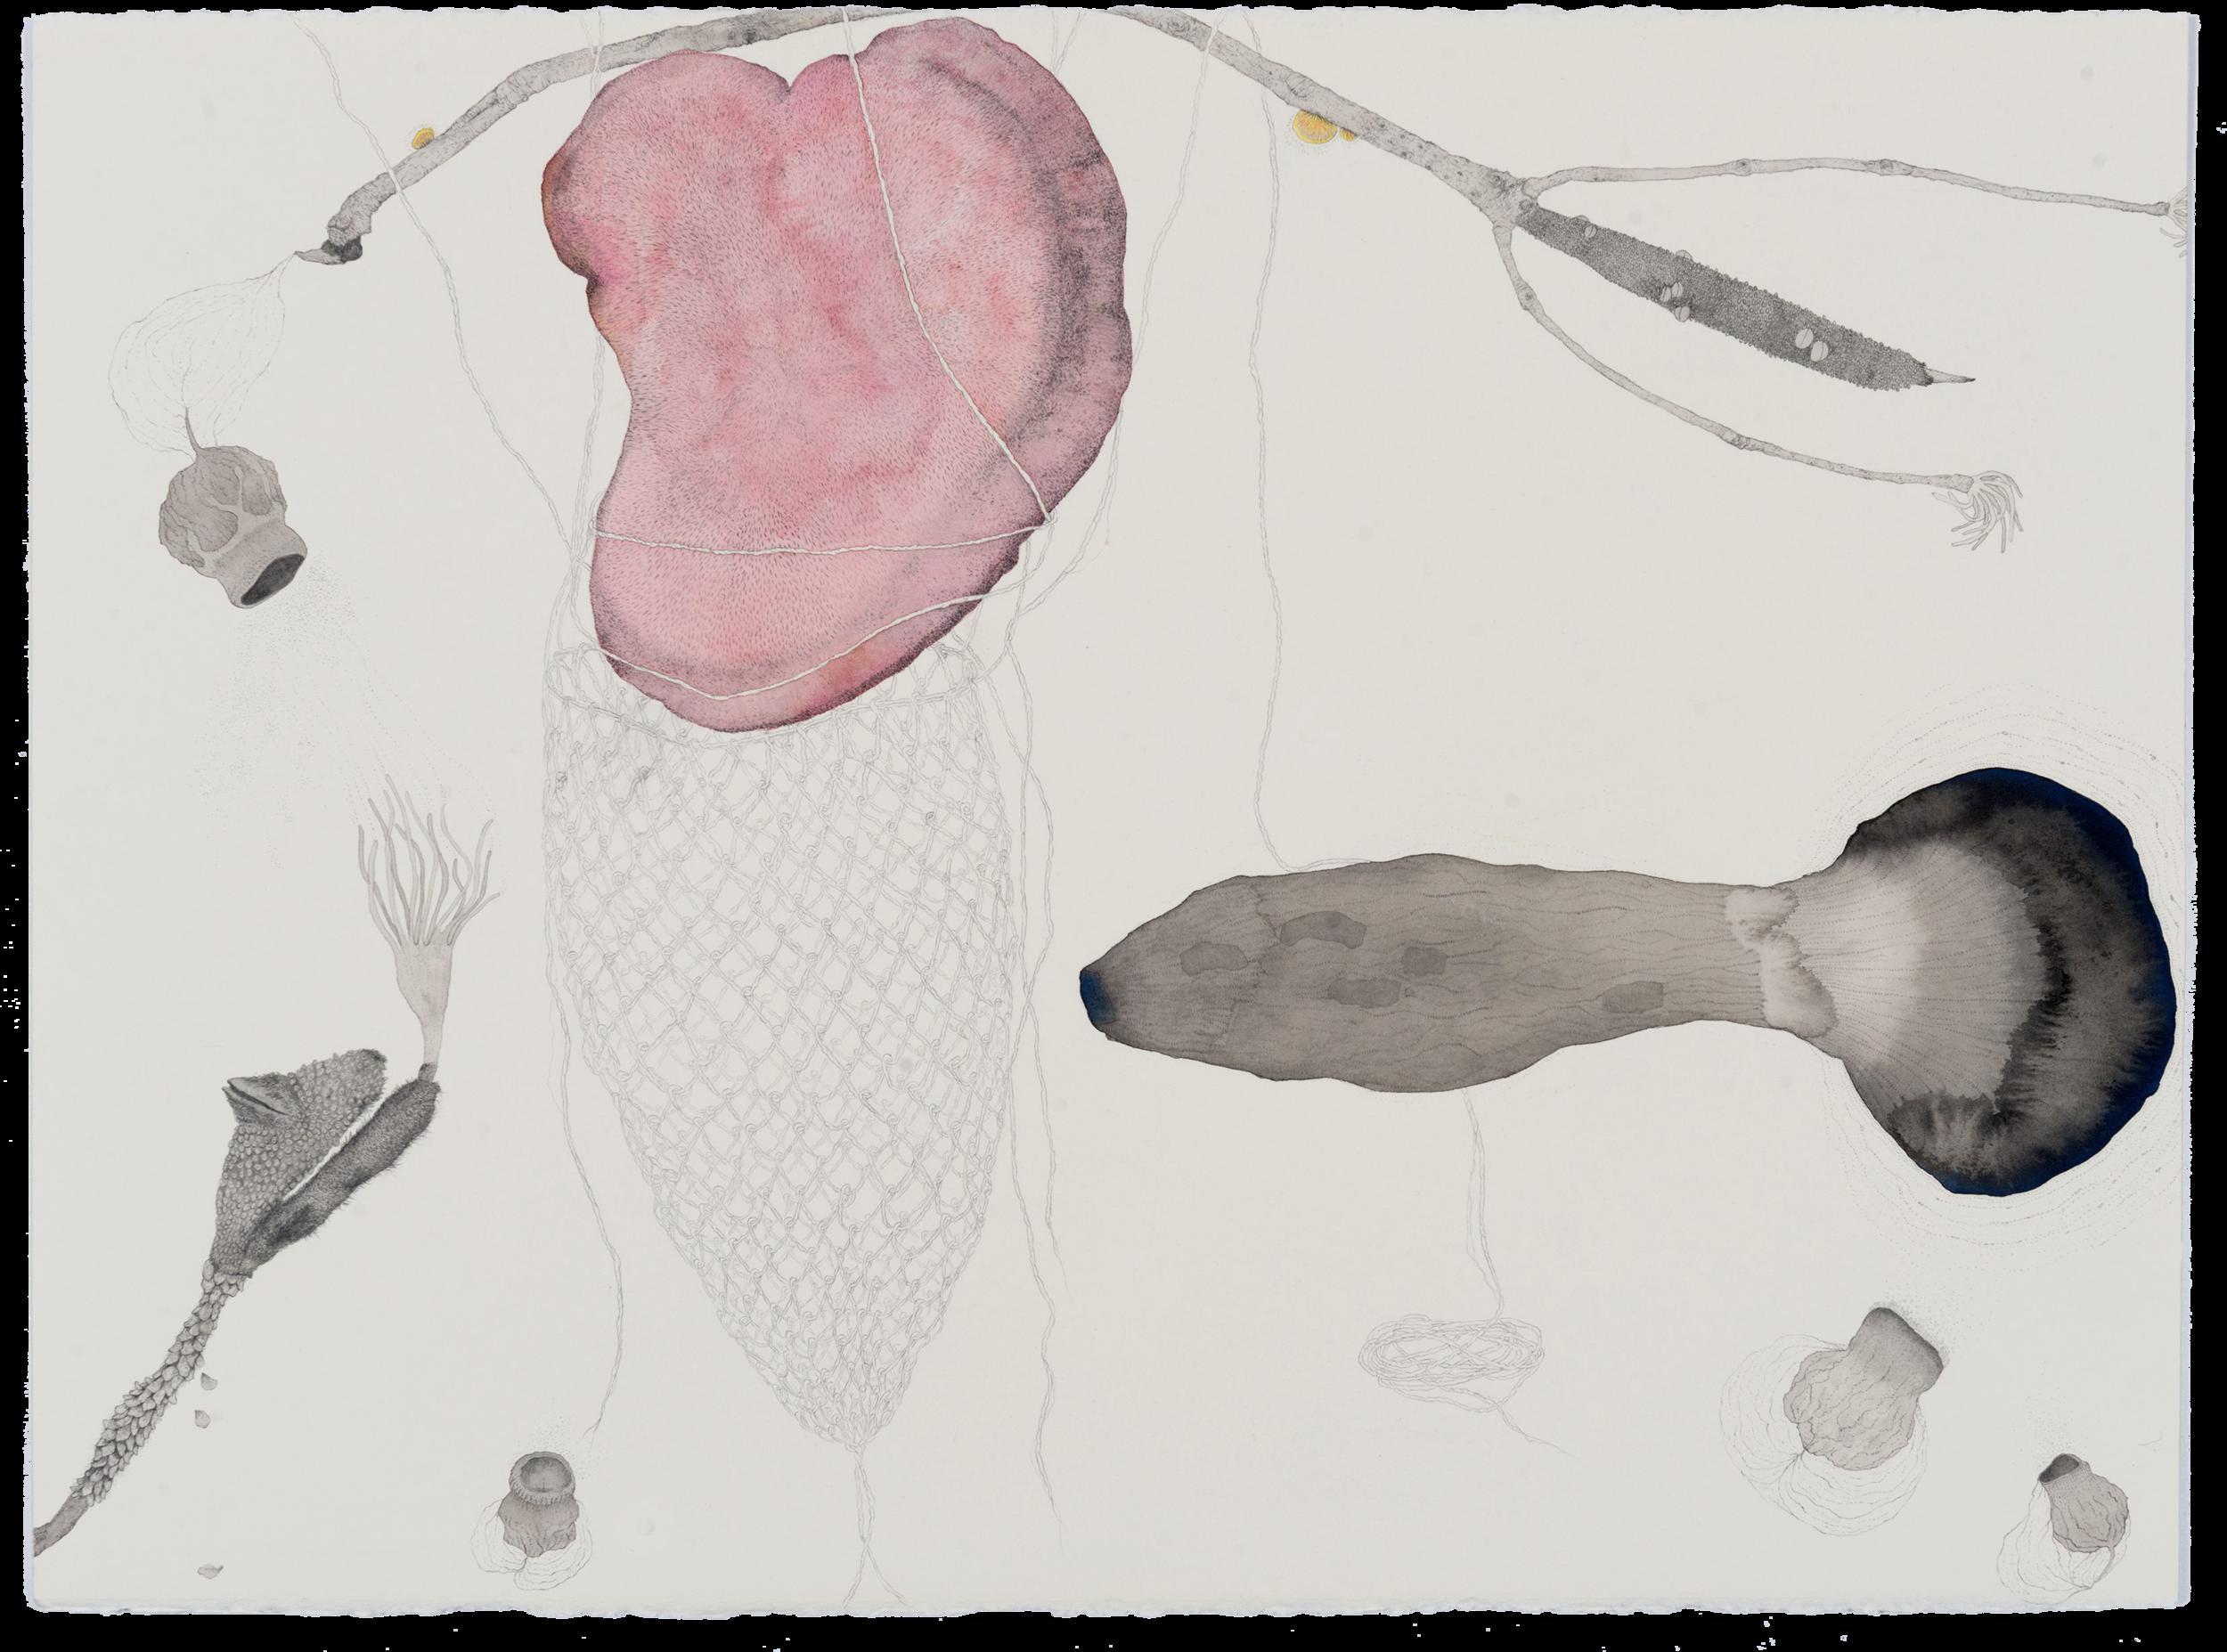 Filum, 2017, ink, graphite and pencil on paper, 57 x 76cm. Photographer: Eva Fernandez